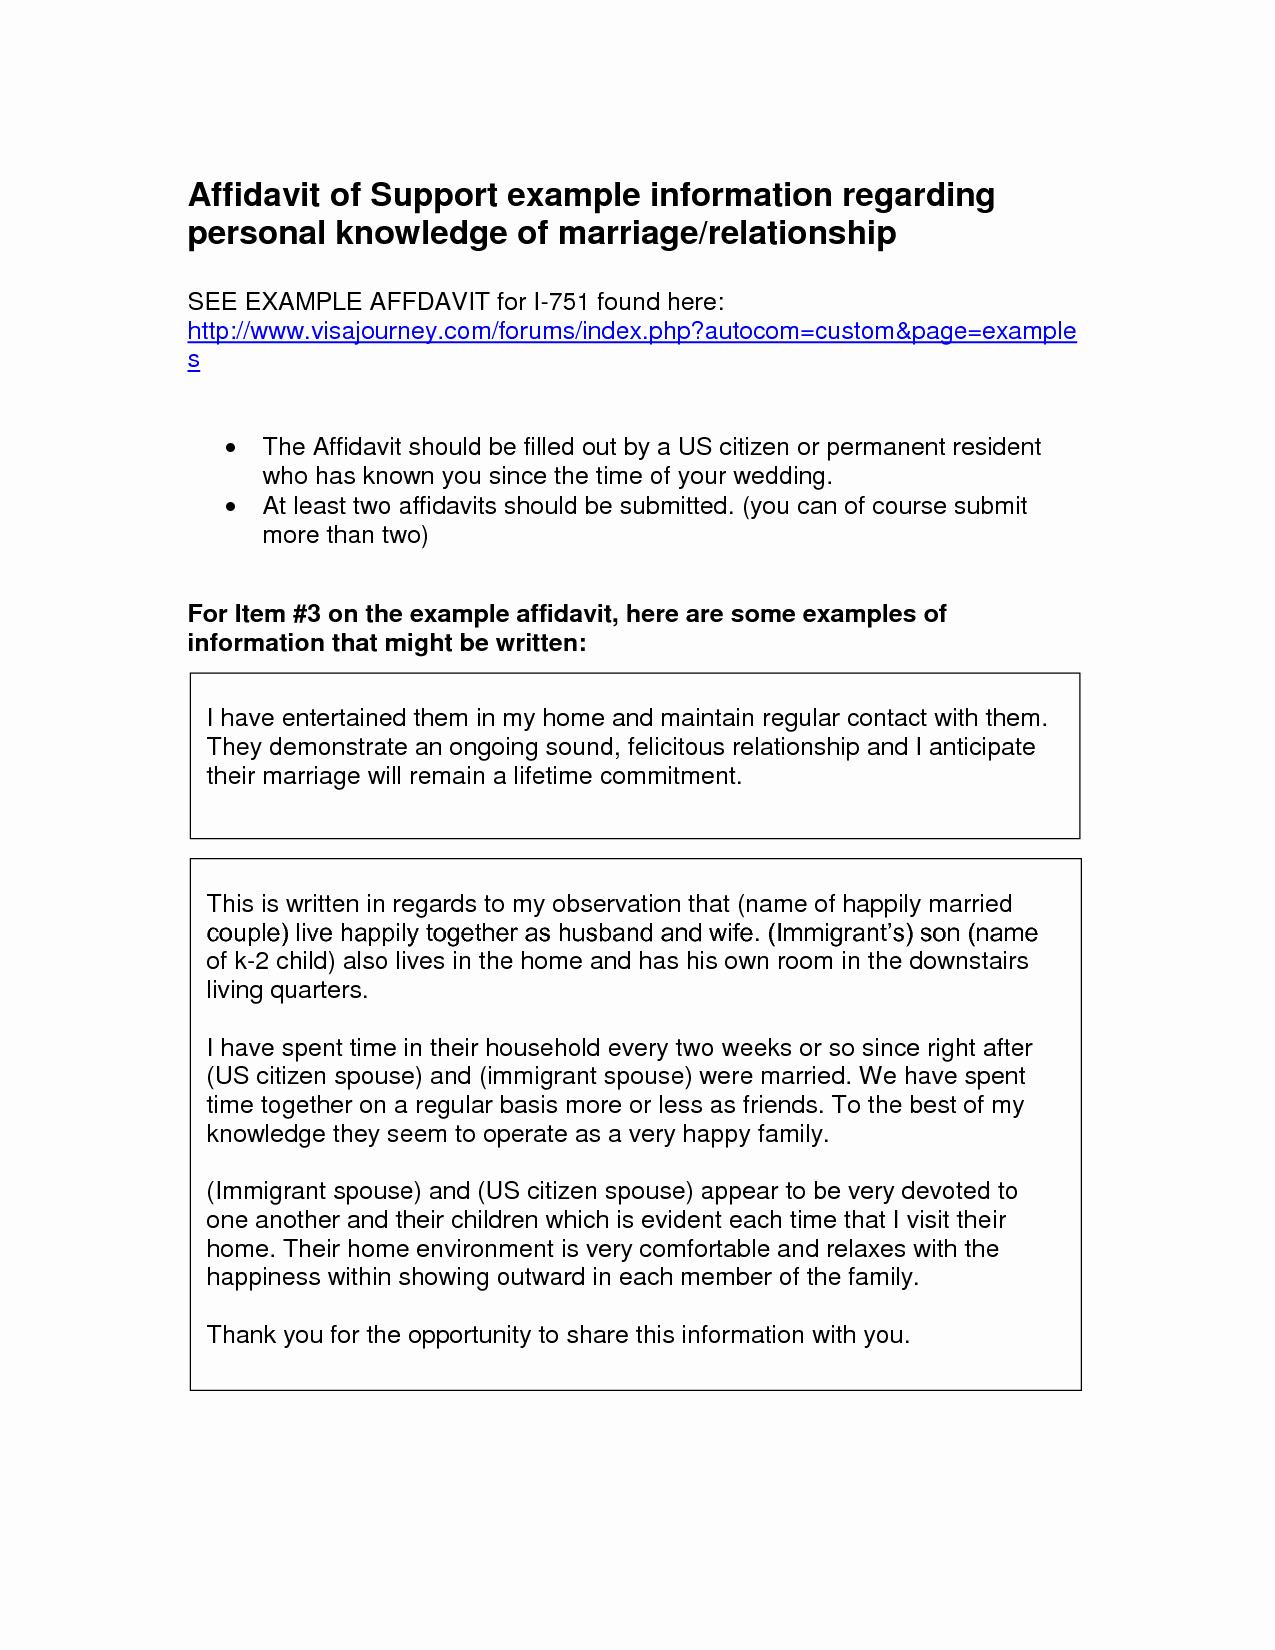 Affidavit Of Support Template Lovely Affidavit Examples Doc by Beunaventuralongjas